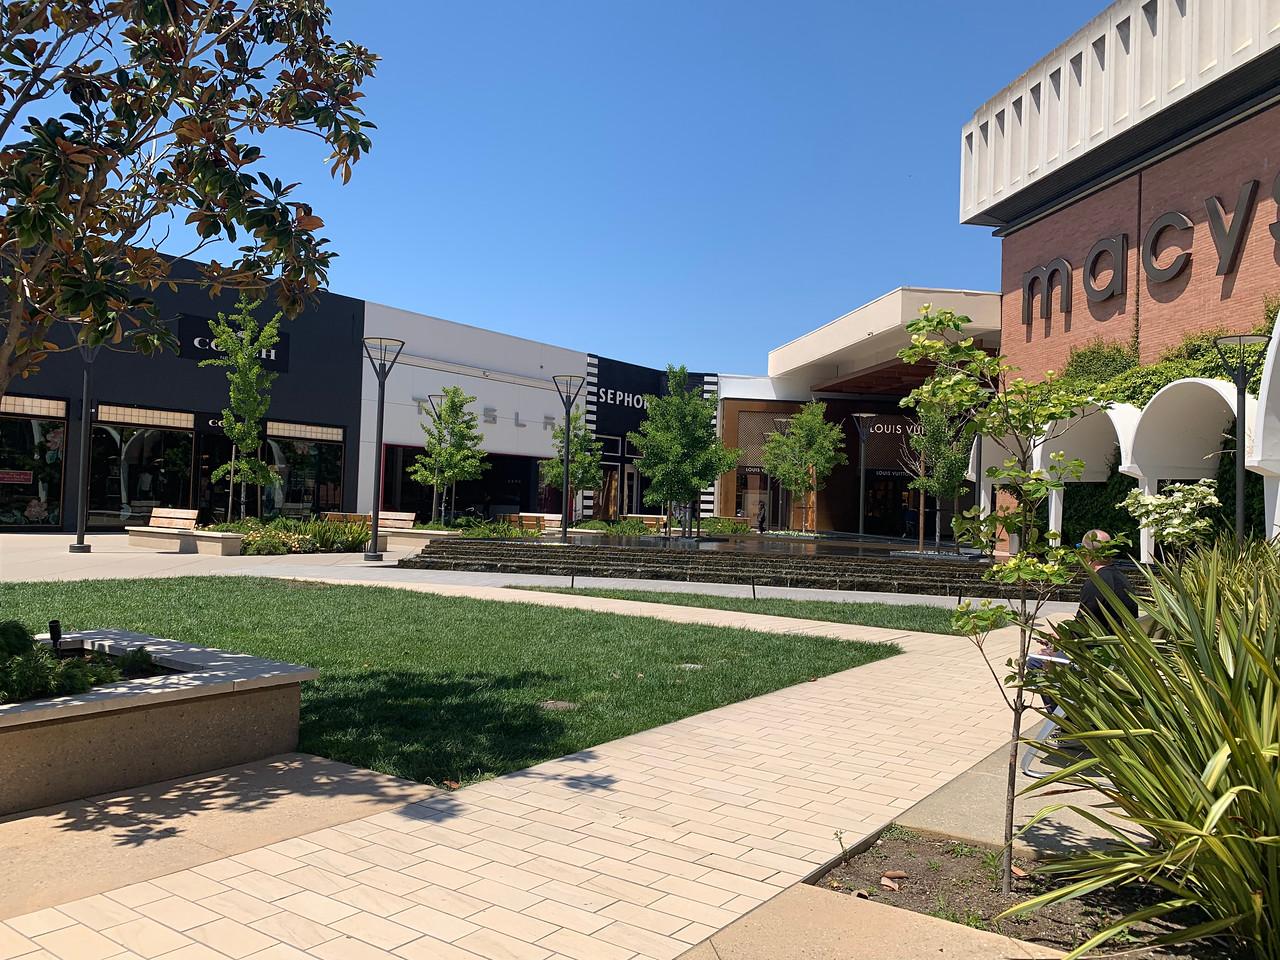 Stanford+Shopping.jpg